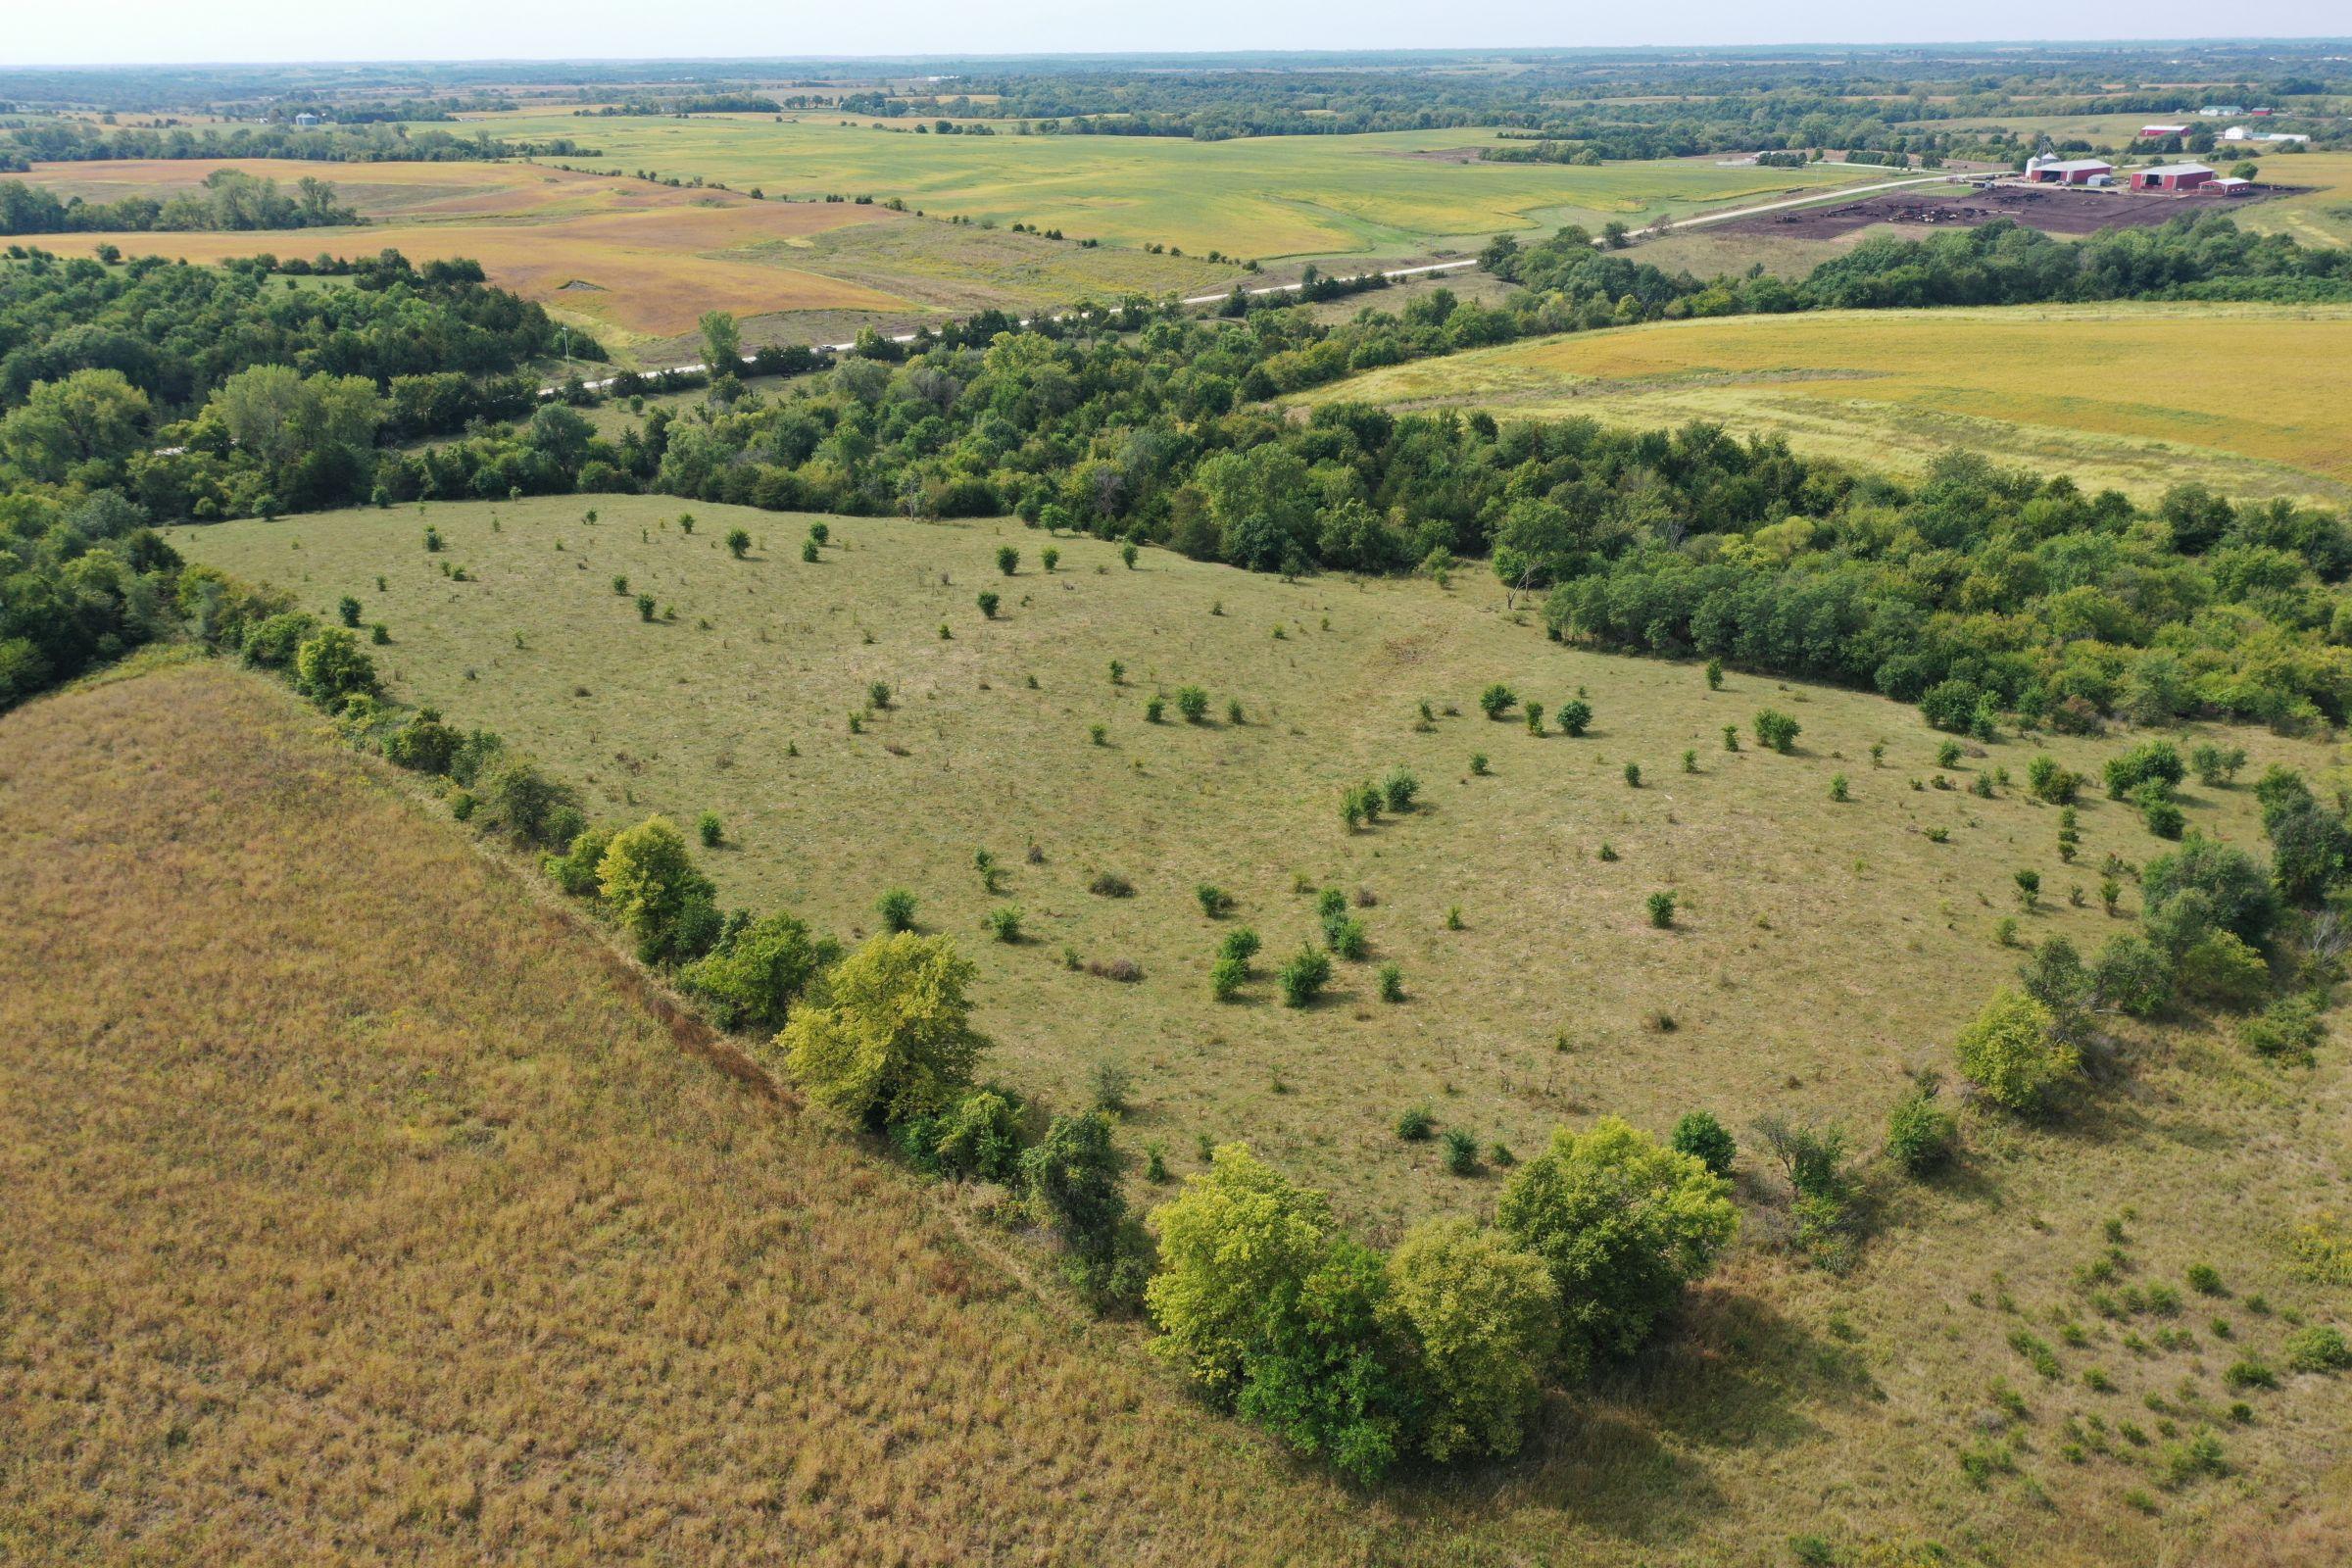 clarke-county-iowa-37-acres-listing-number-15398-4-2021-03-08-151155.jpg